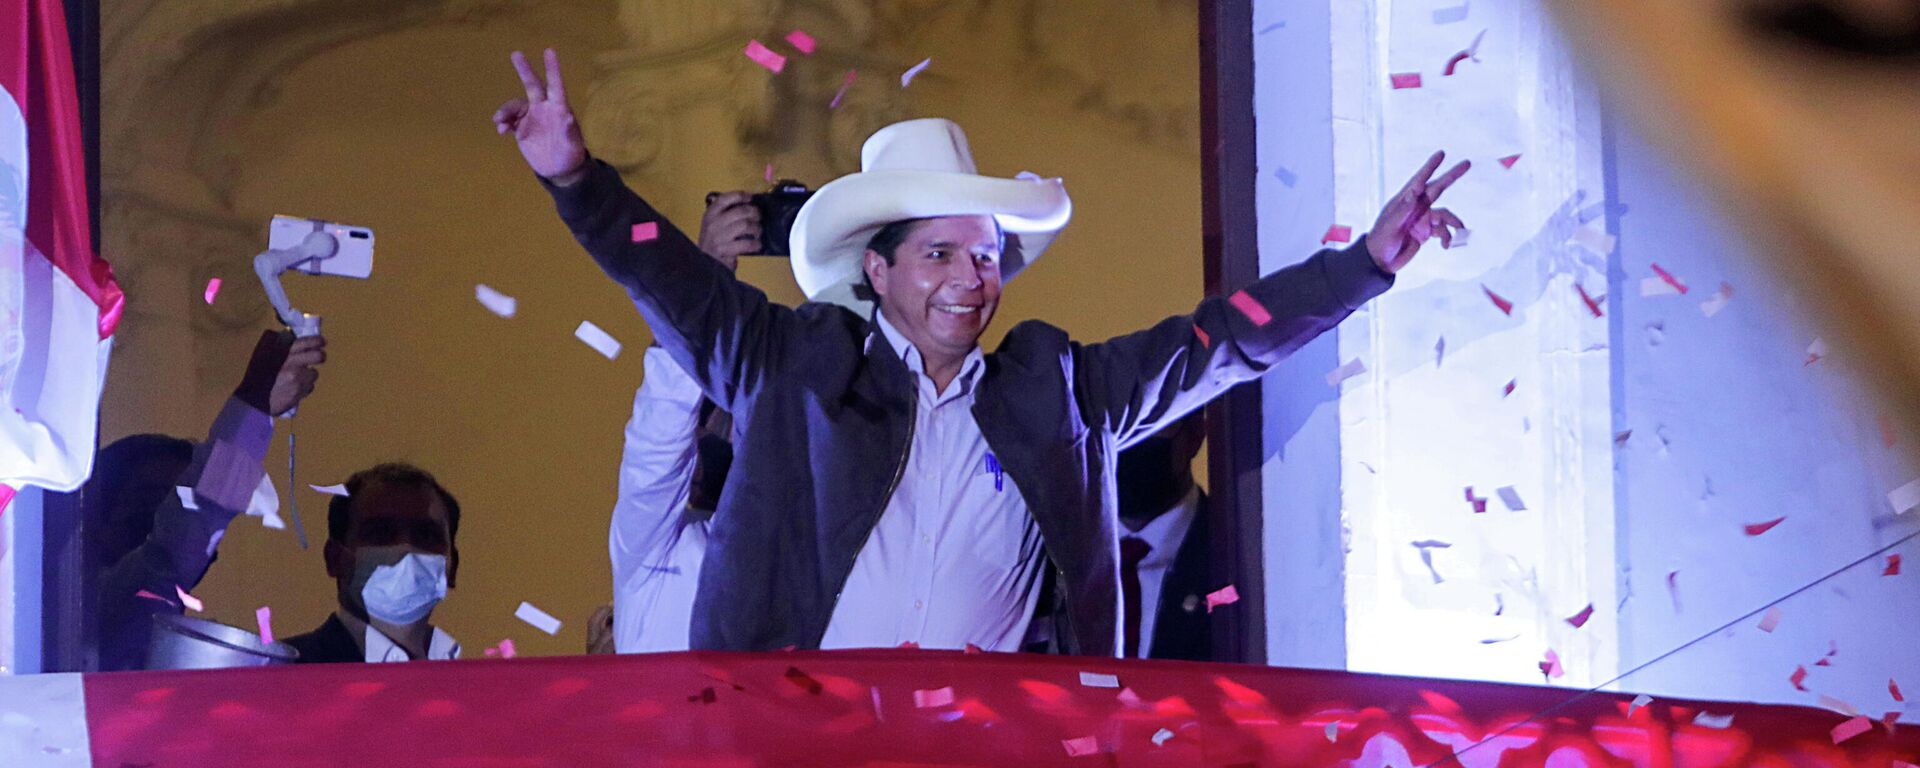 E presidente electo de Perú, Pedro Castillo - Sputnik Mundo, 1920, 21.07.2021